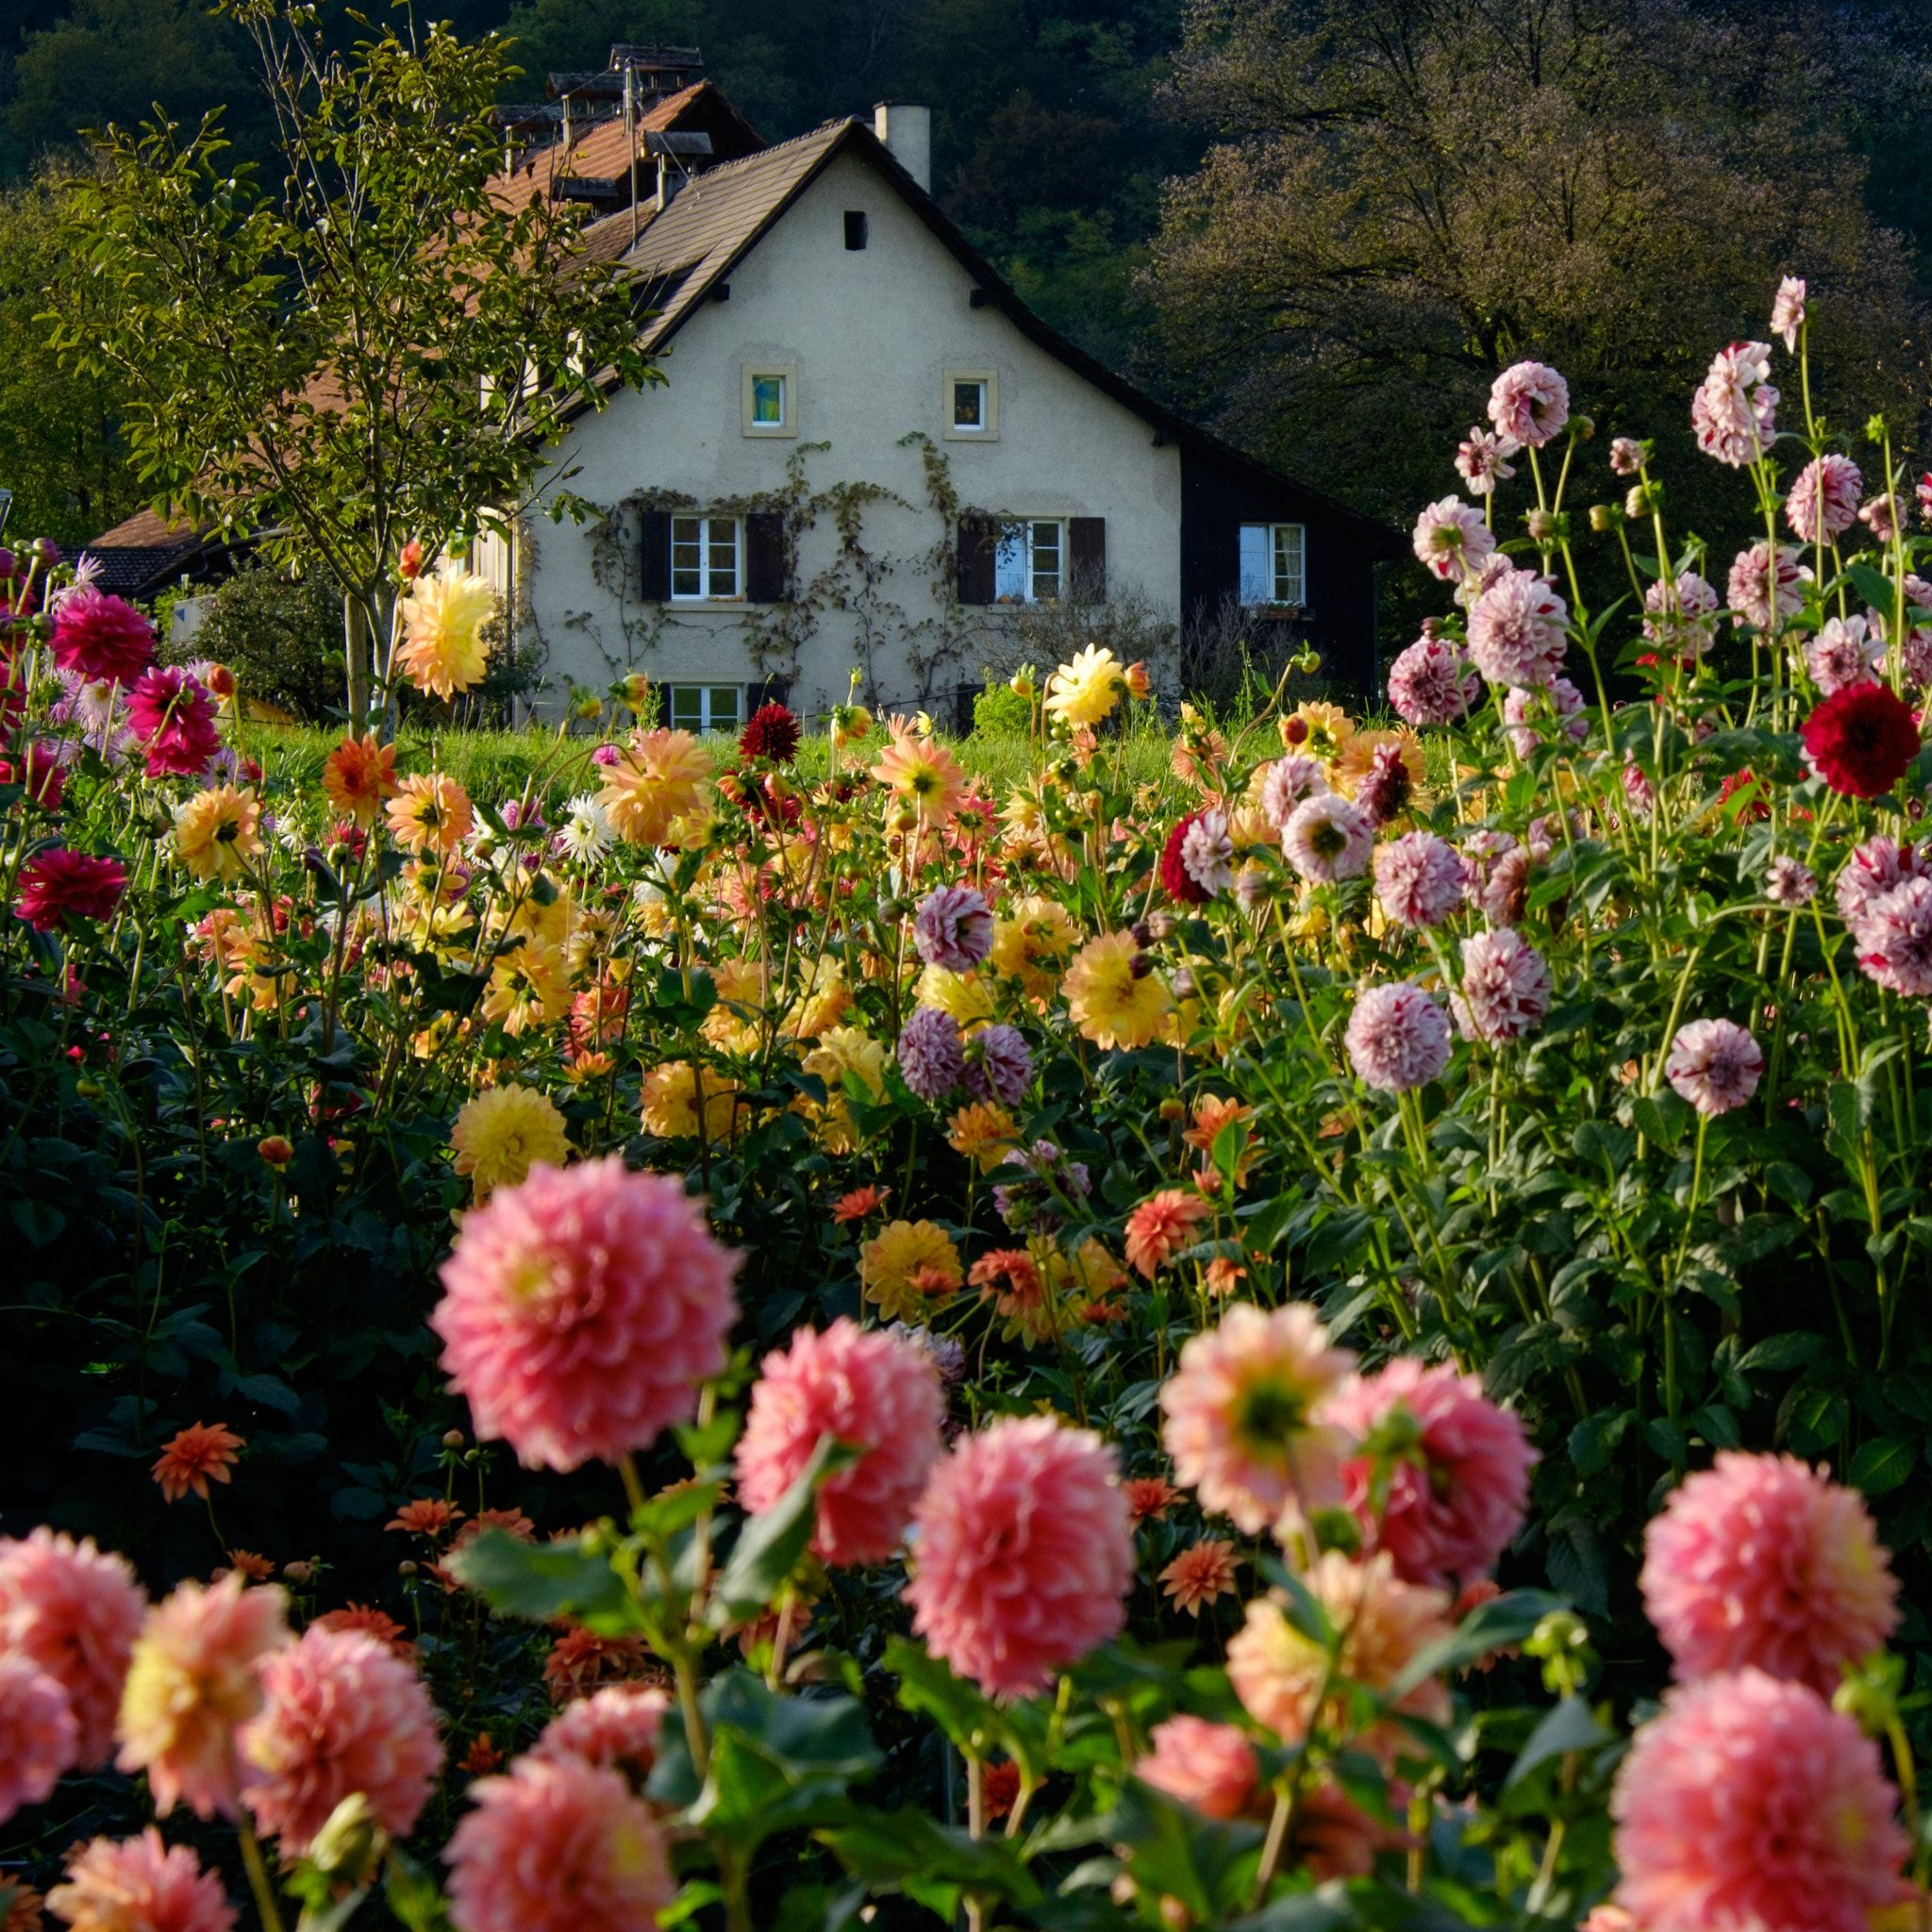 Swiss farmhouse, garden of Dahlias - Flower garden of dahlias. Swiss Farmhouse; Baselland, Switzerland.